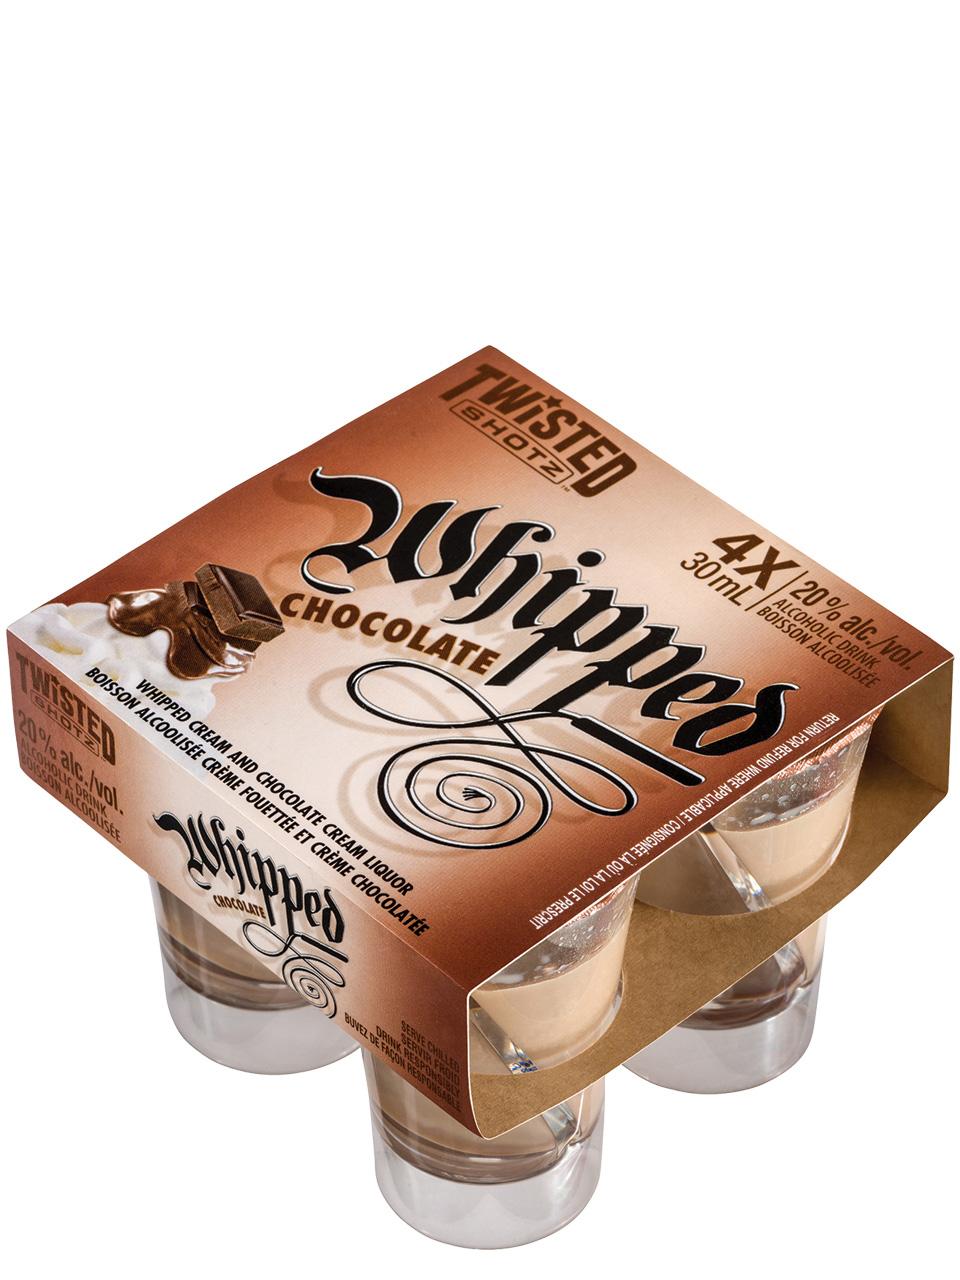 Twisted Shotz Whipped Chocolate 4pk